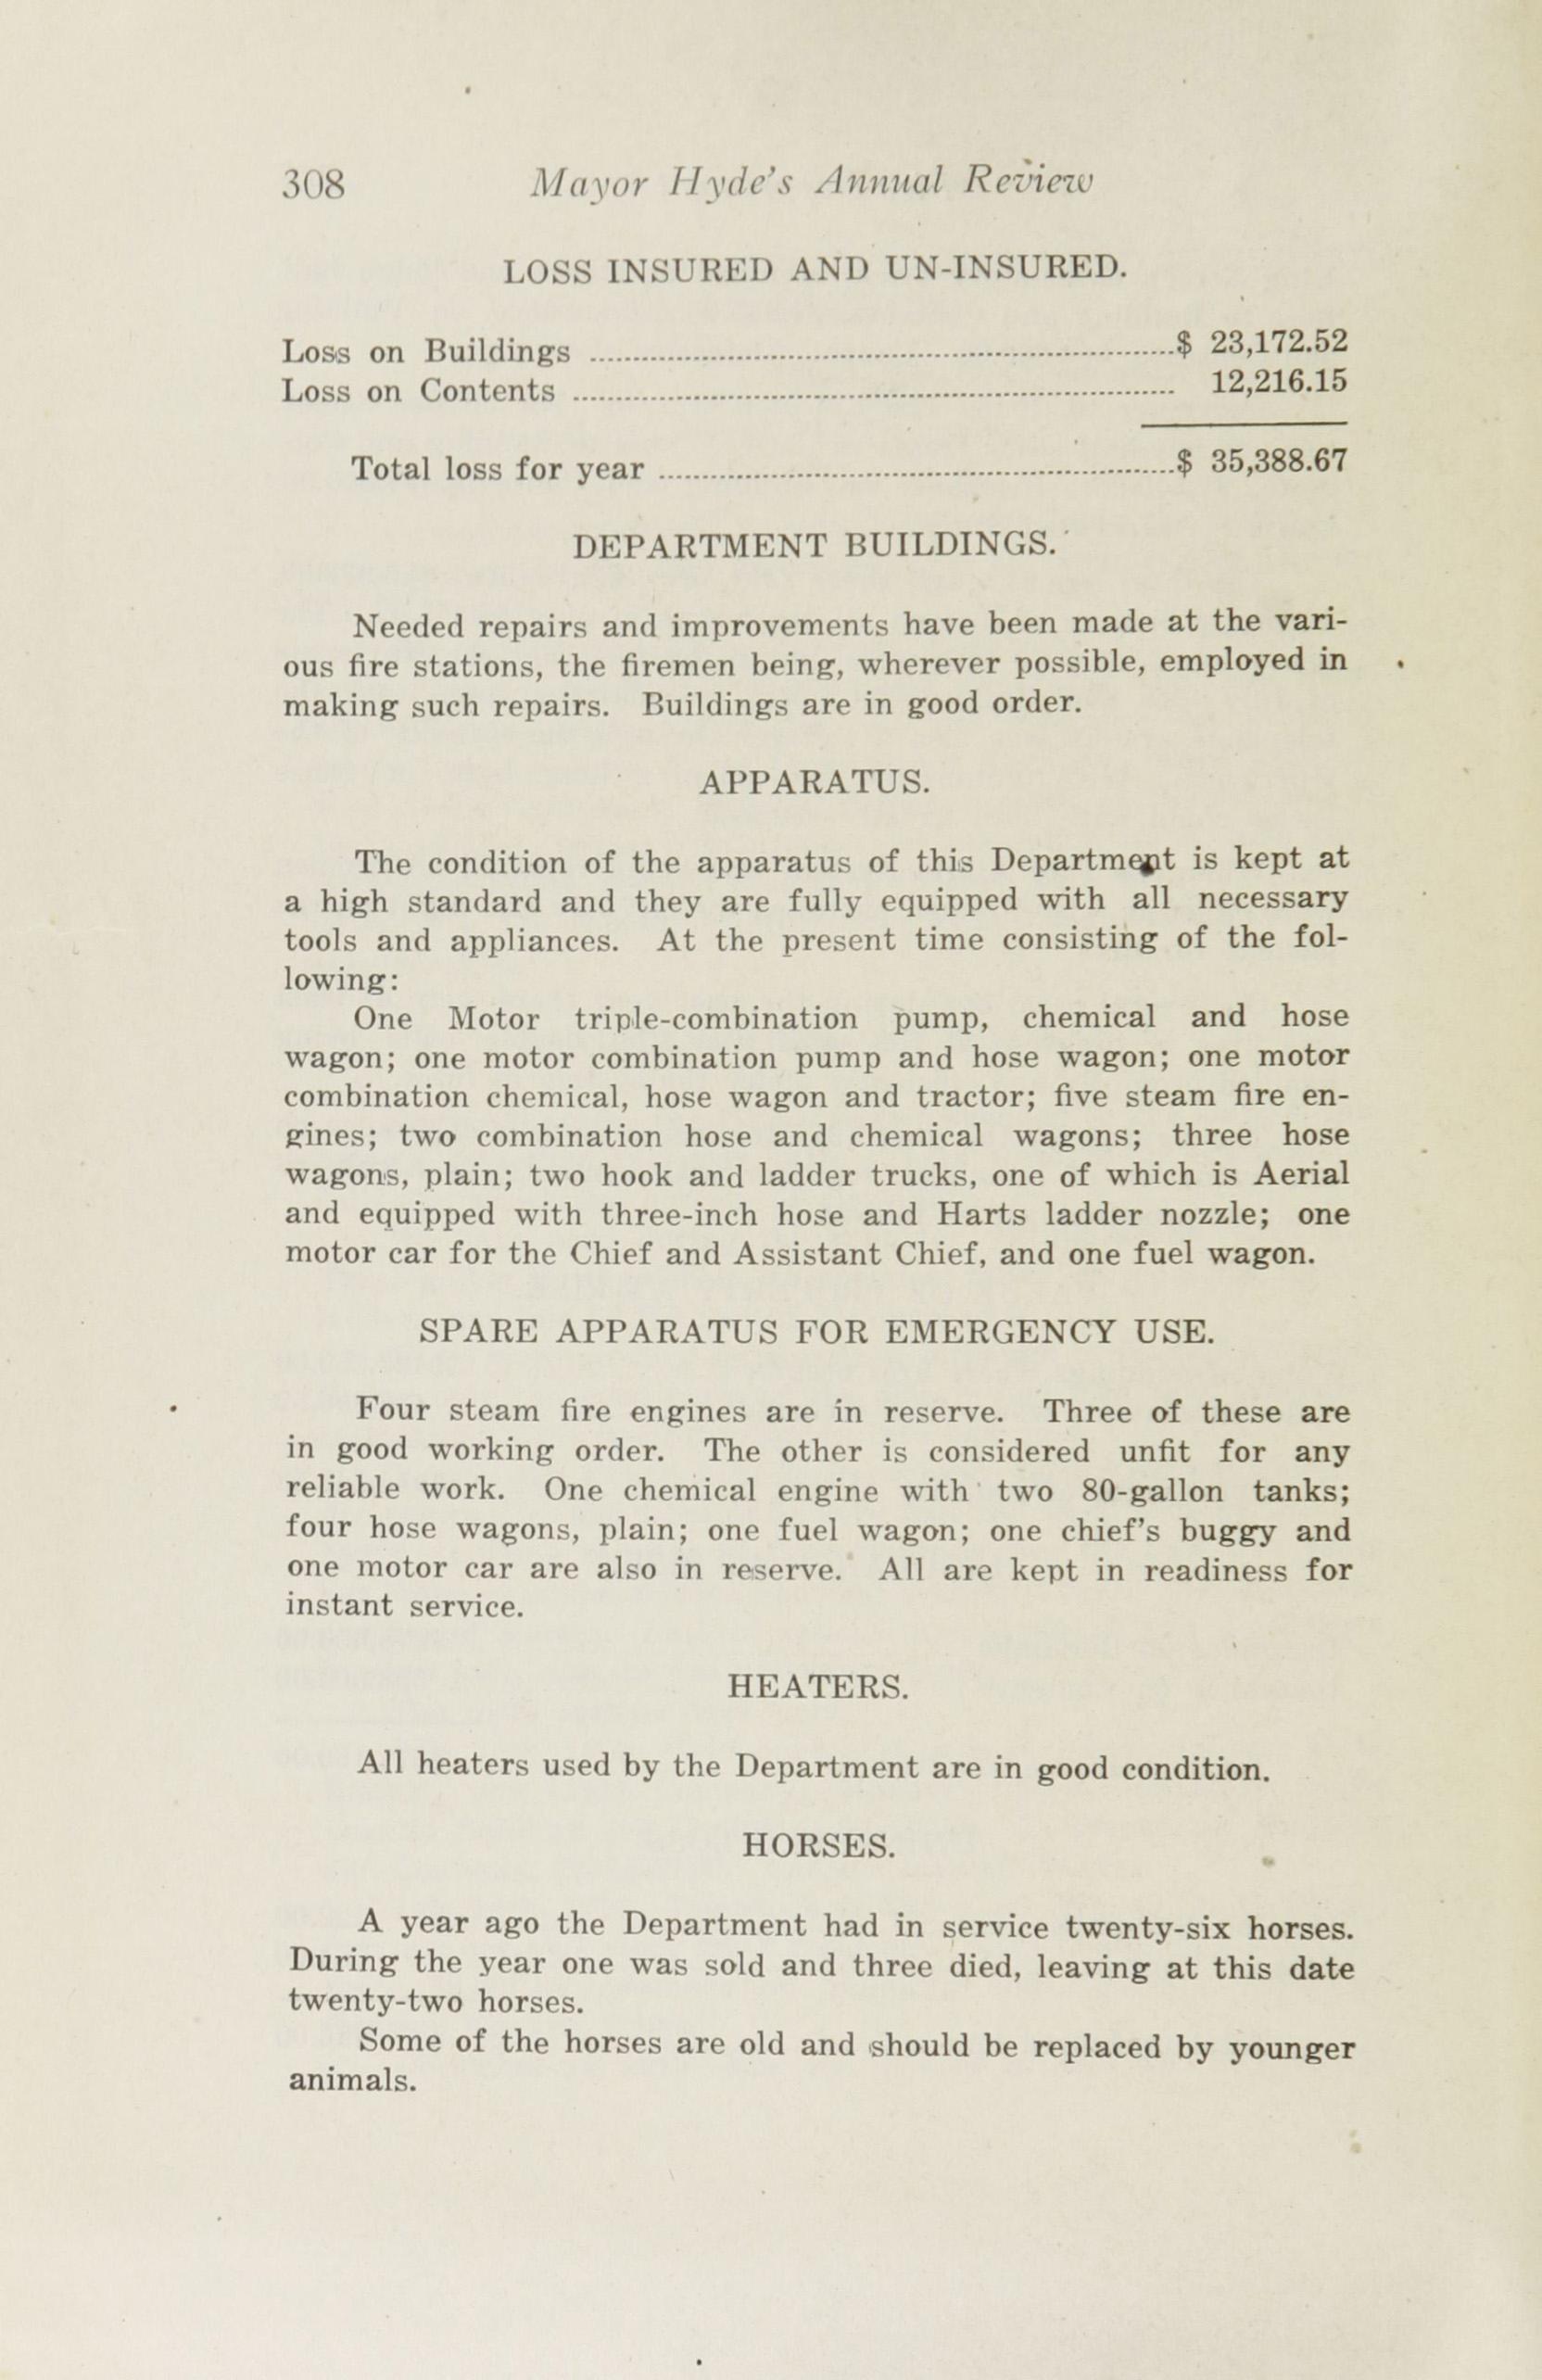 Charleston Yearbook, 1916, page 308